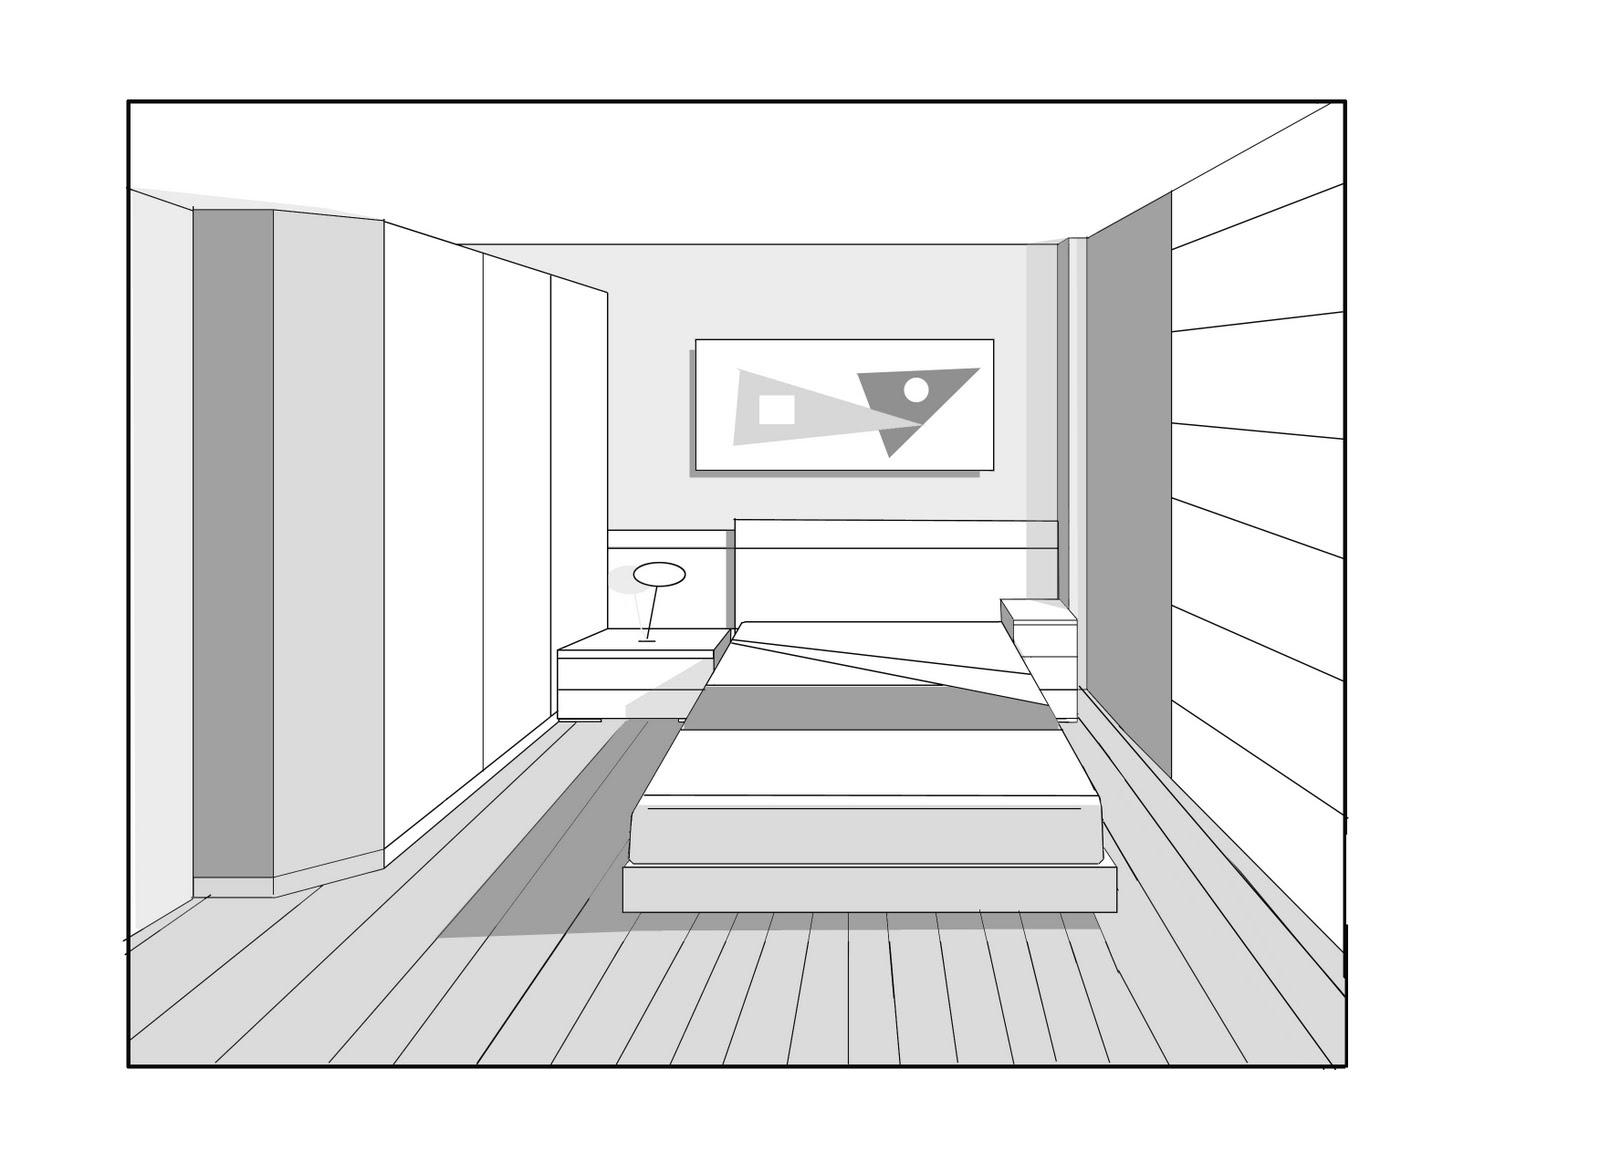 interiorista freelance projecte 12 dormitori matrimoni